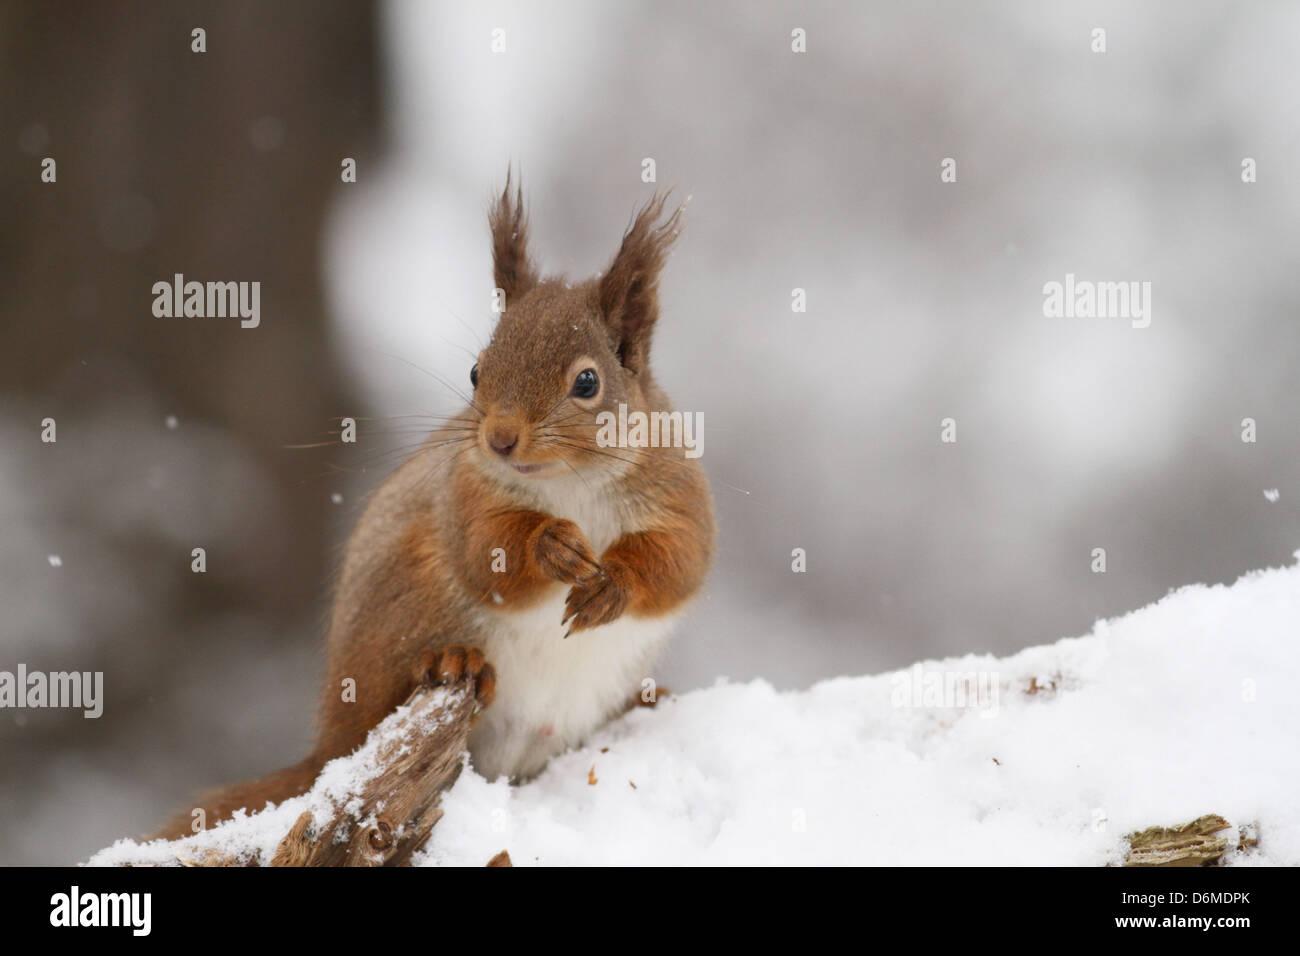 Red Squirrel (Sciurus vulgaris) feeding in snow covered Caledonian Pine Forest. Scotland. - Stock Image